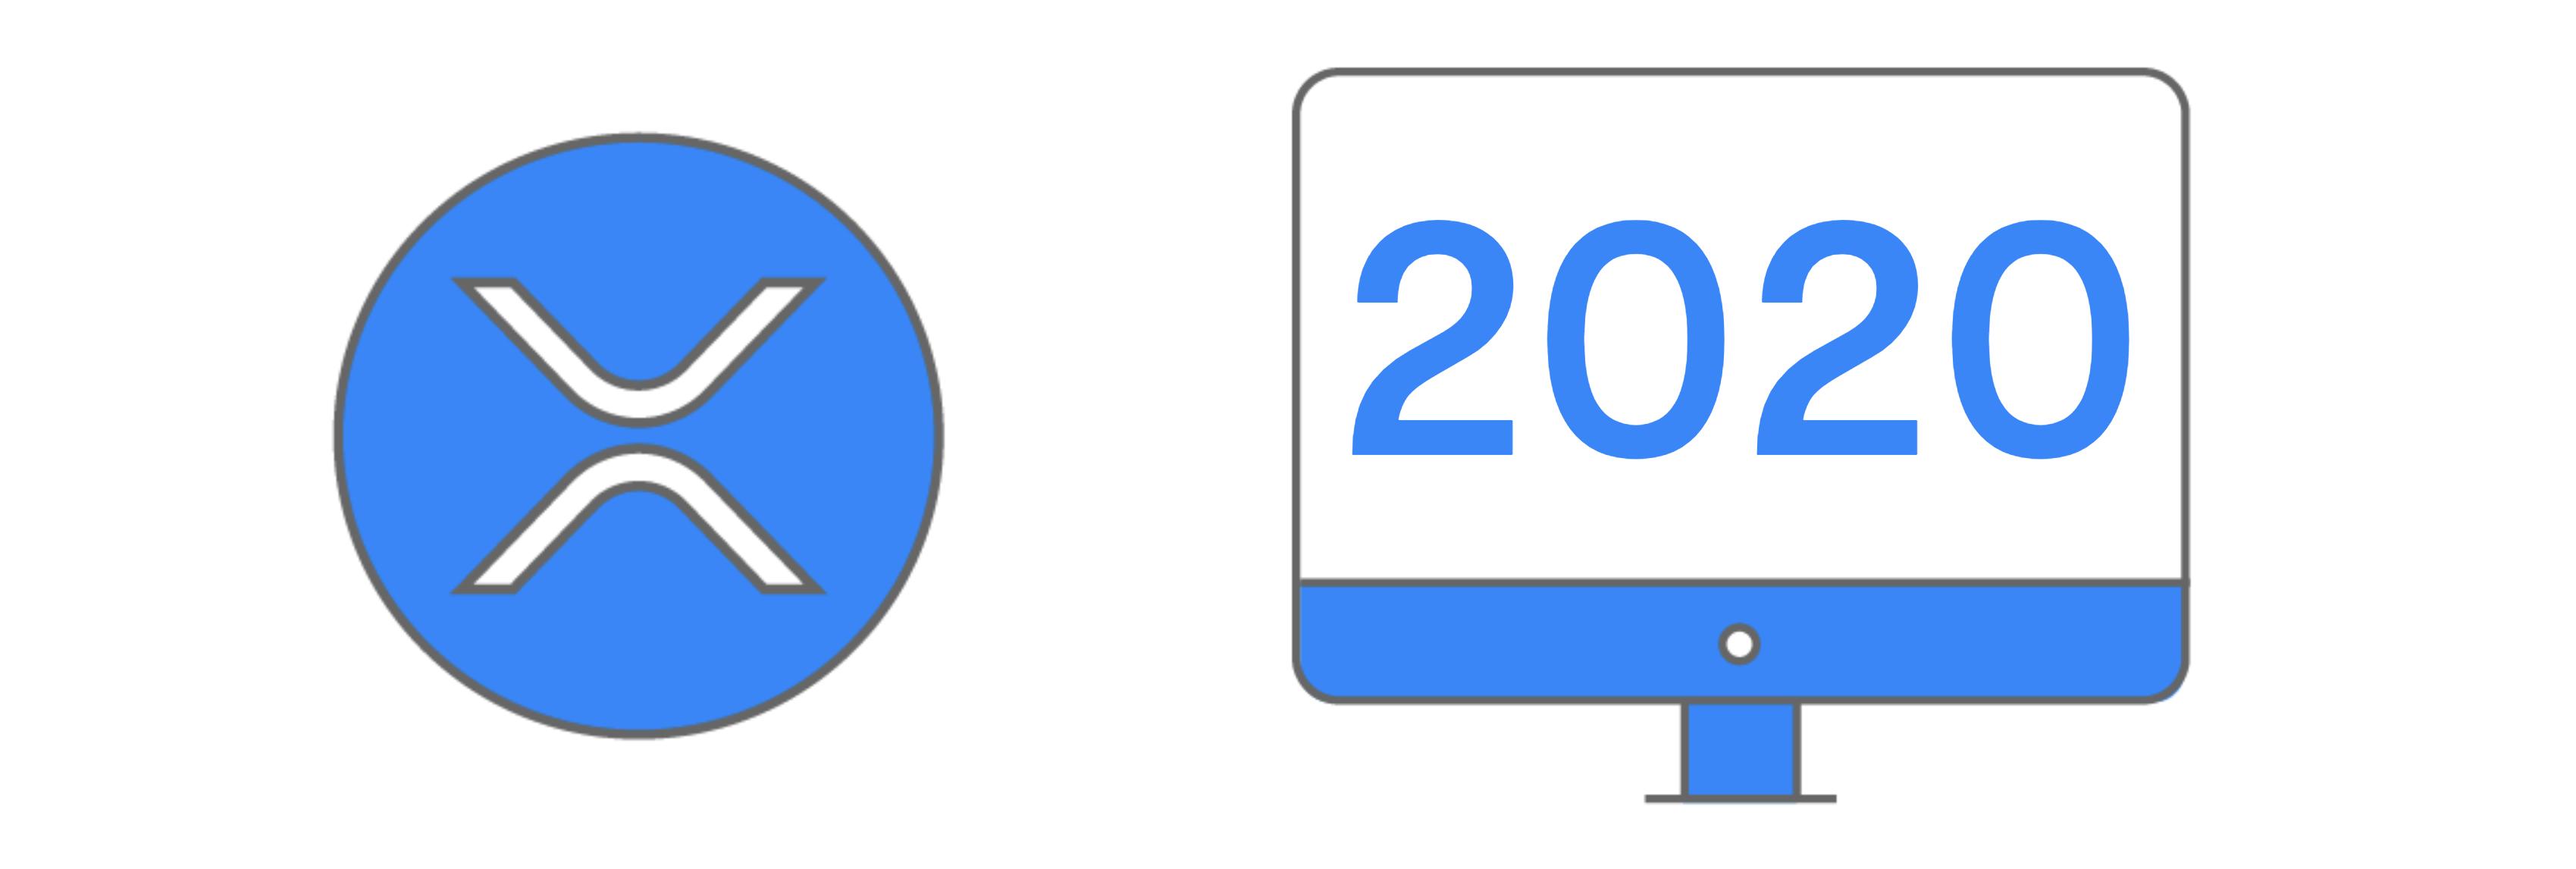 Ripple price prediction 2020 - Bitcoin forecast analysis | BTC Direct